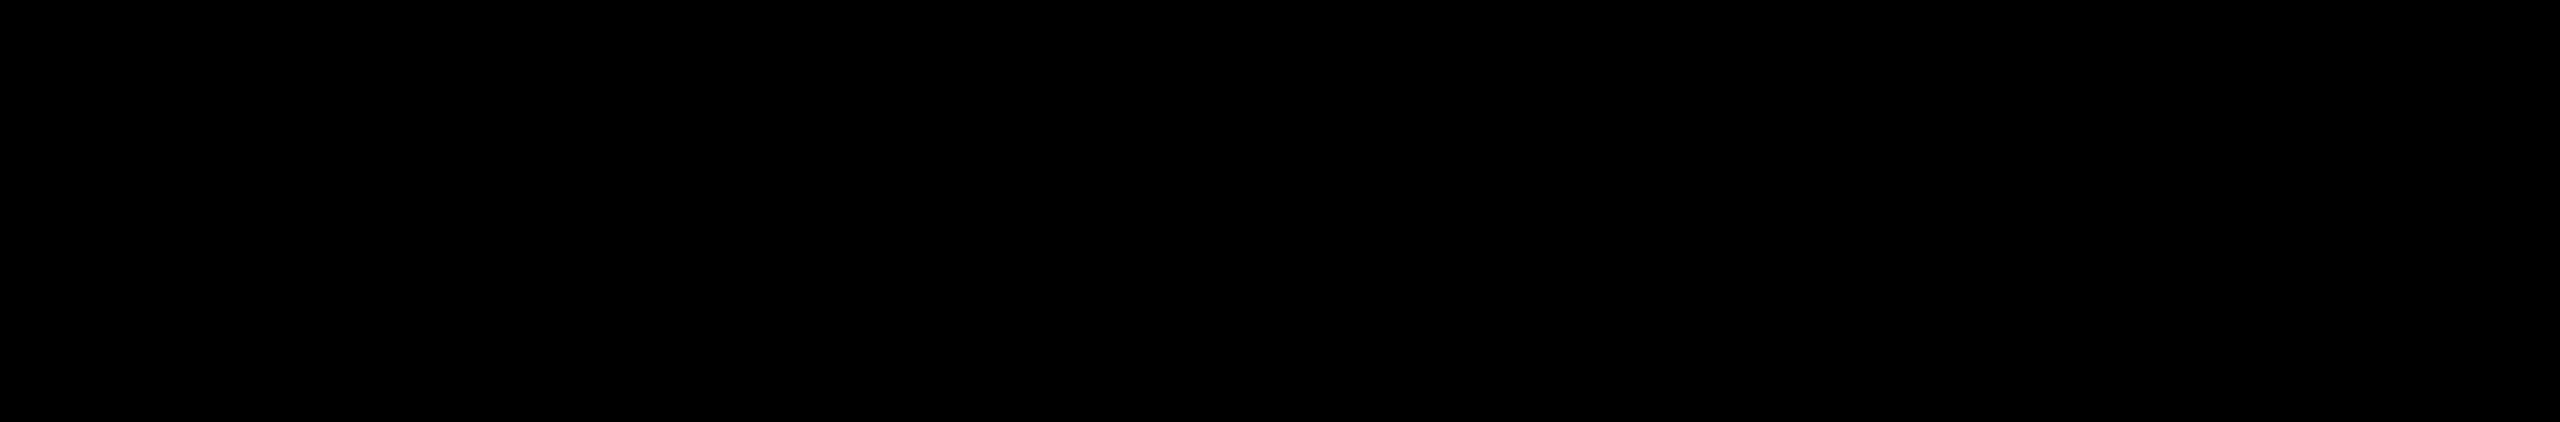 Llaunes 120 x 20 cm